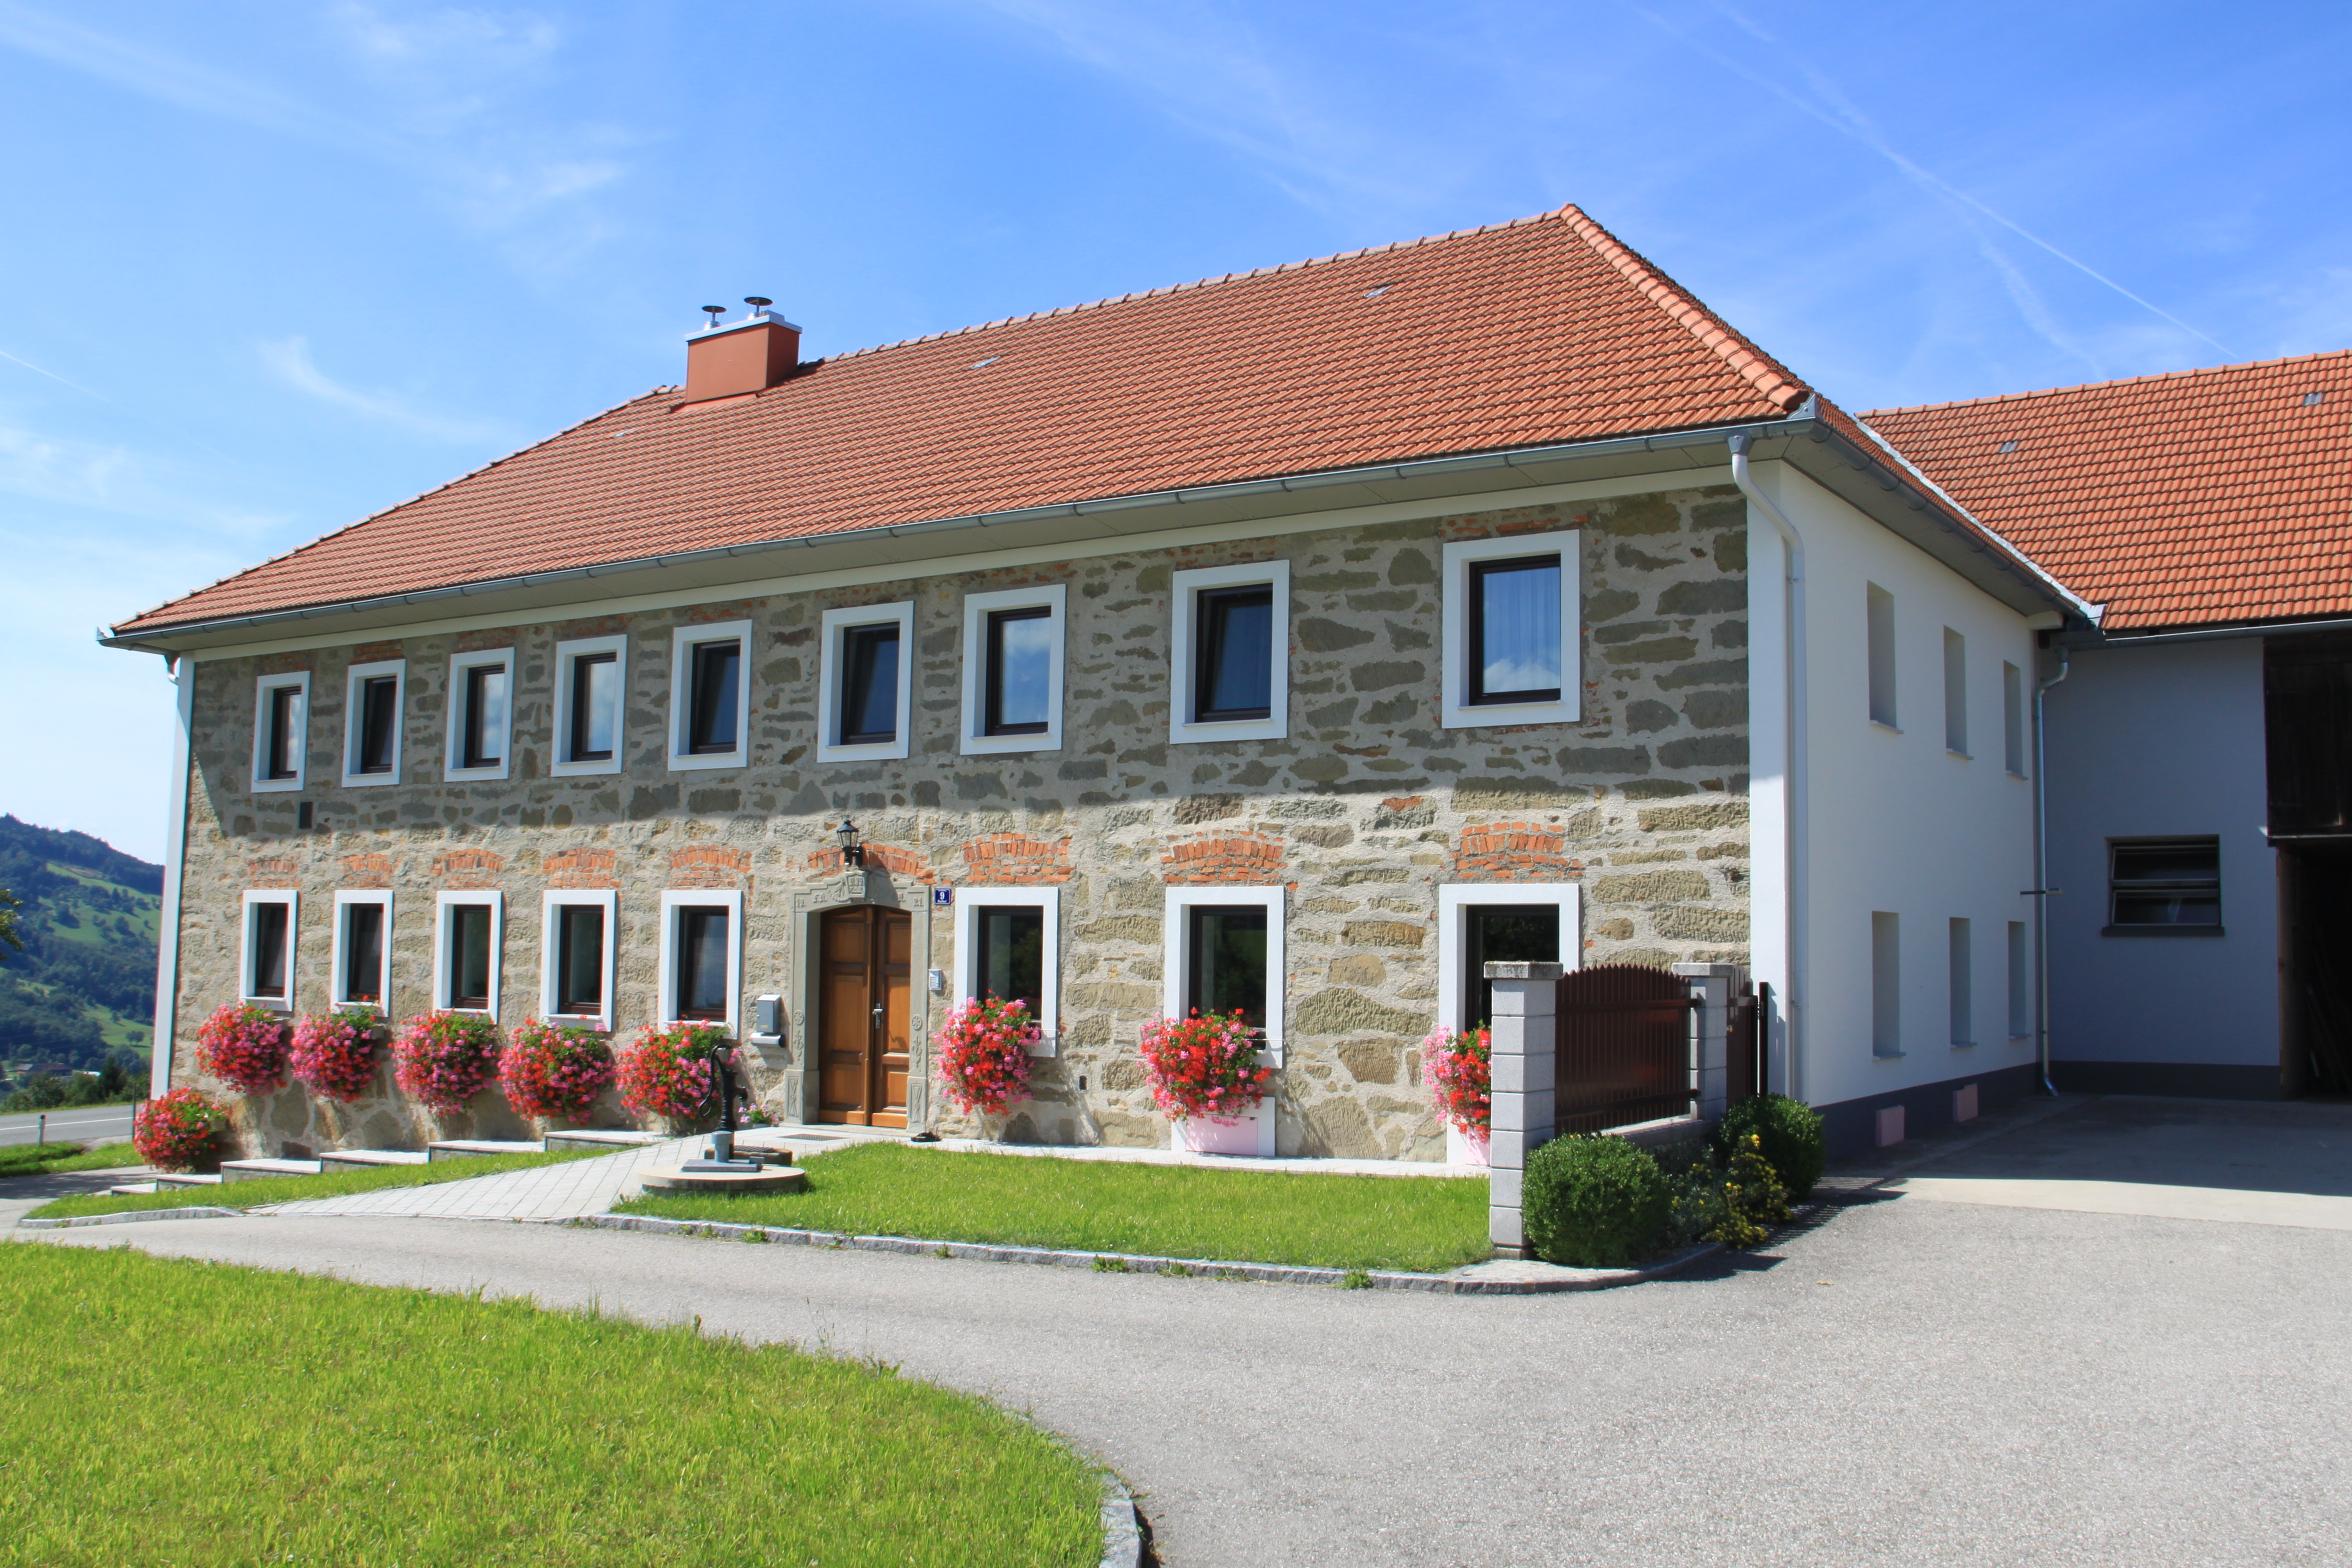 http://www.der-bauberater.at/wp-content/uploads/2017/10/Umbau-4kant-Bauernhof_02.jpg